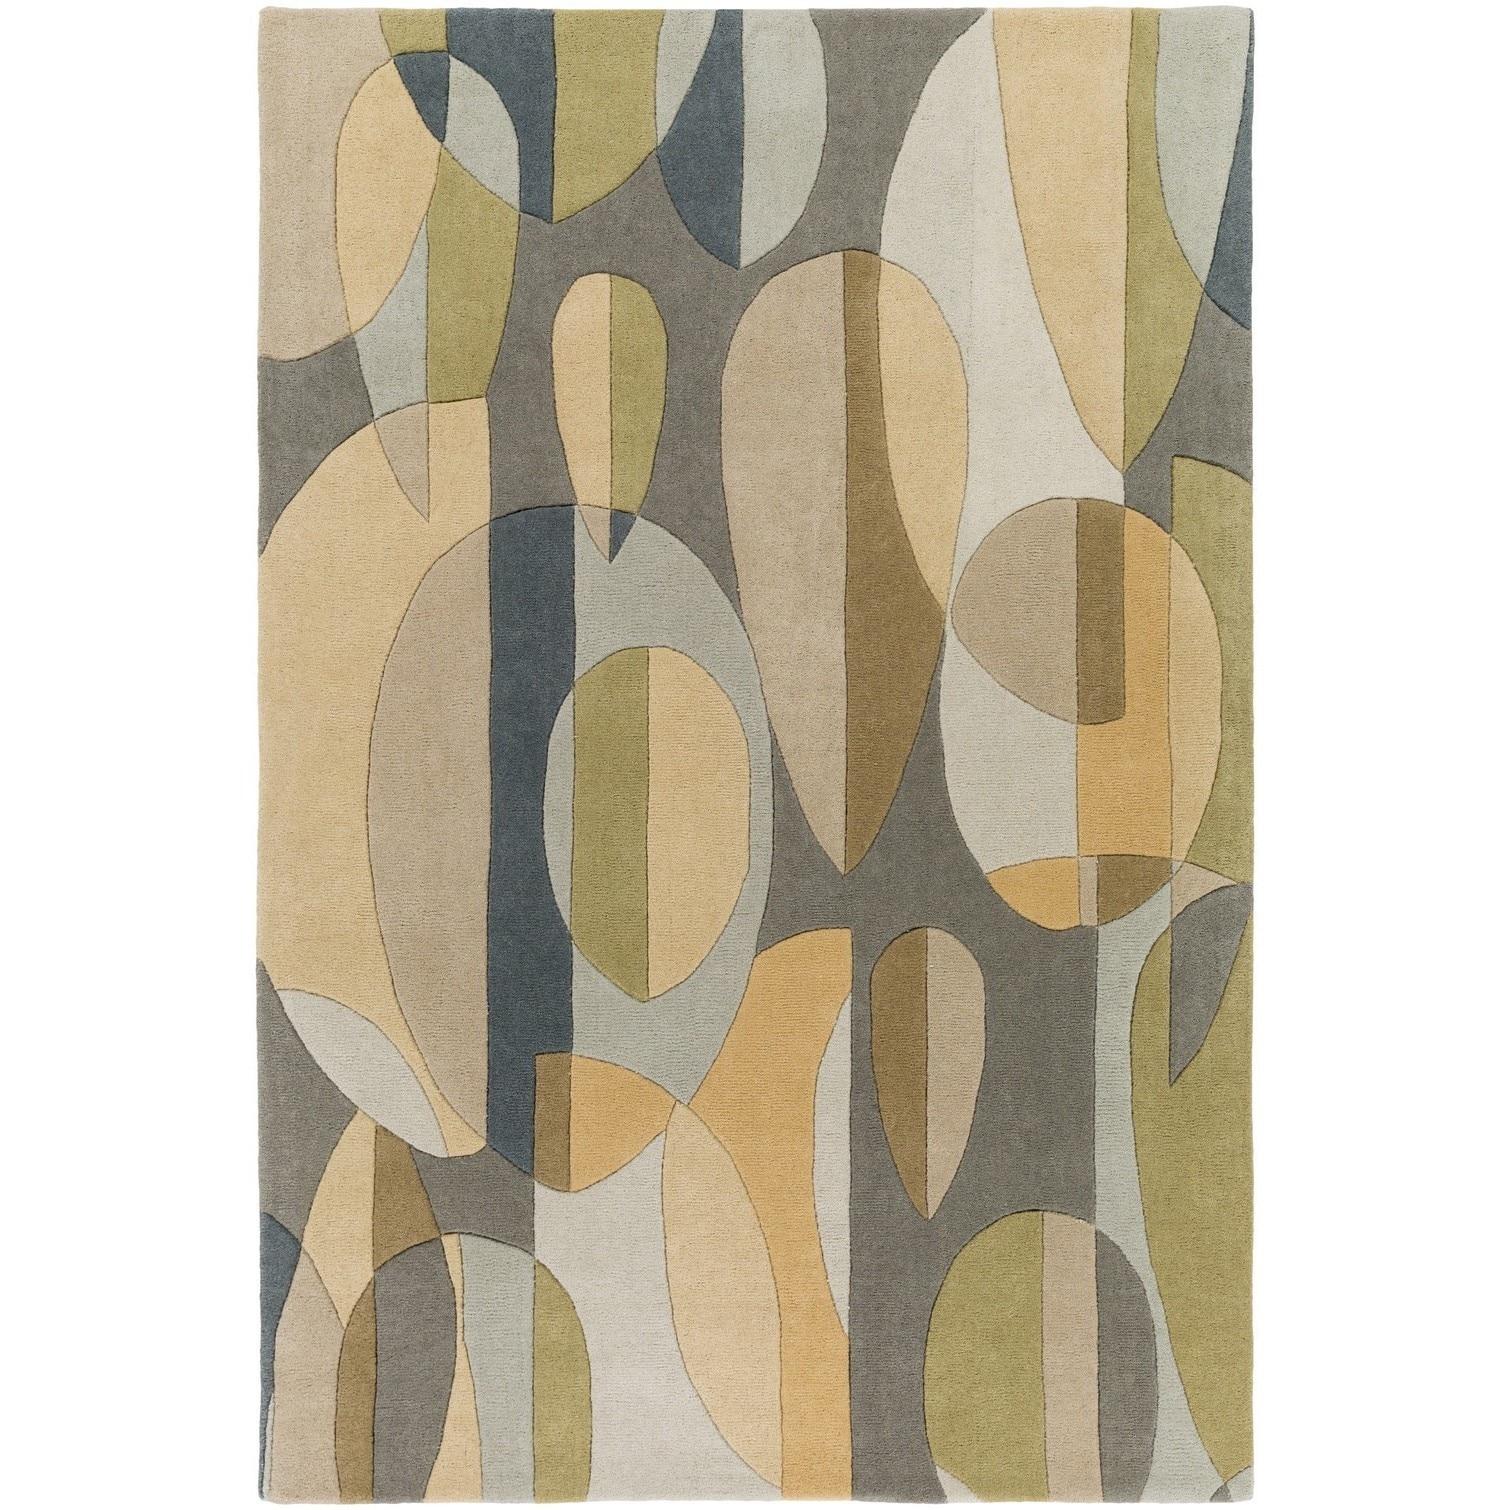 Hand Tufted Hana Wool Area Rug 7 X 9 Beige Tan Brown Size